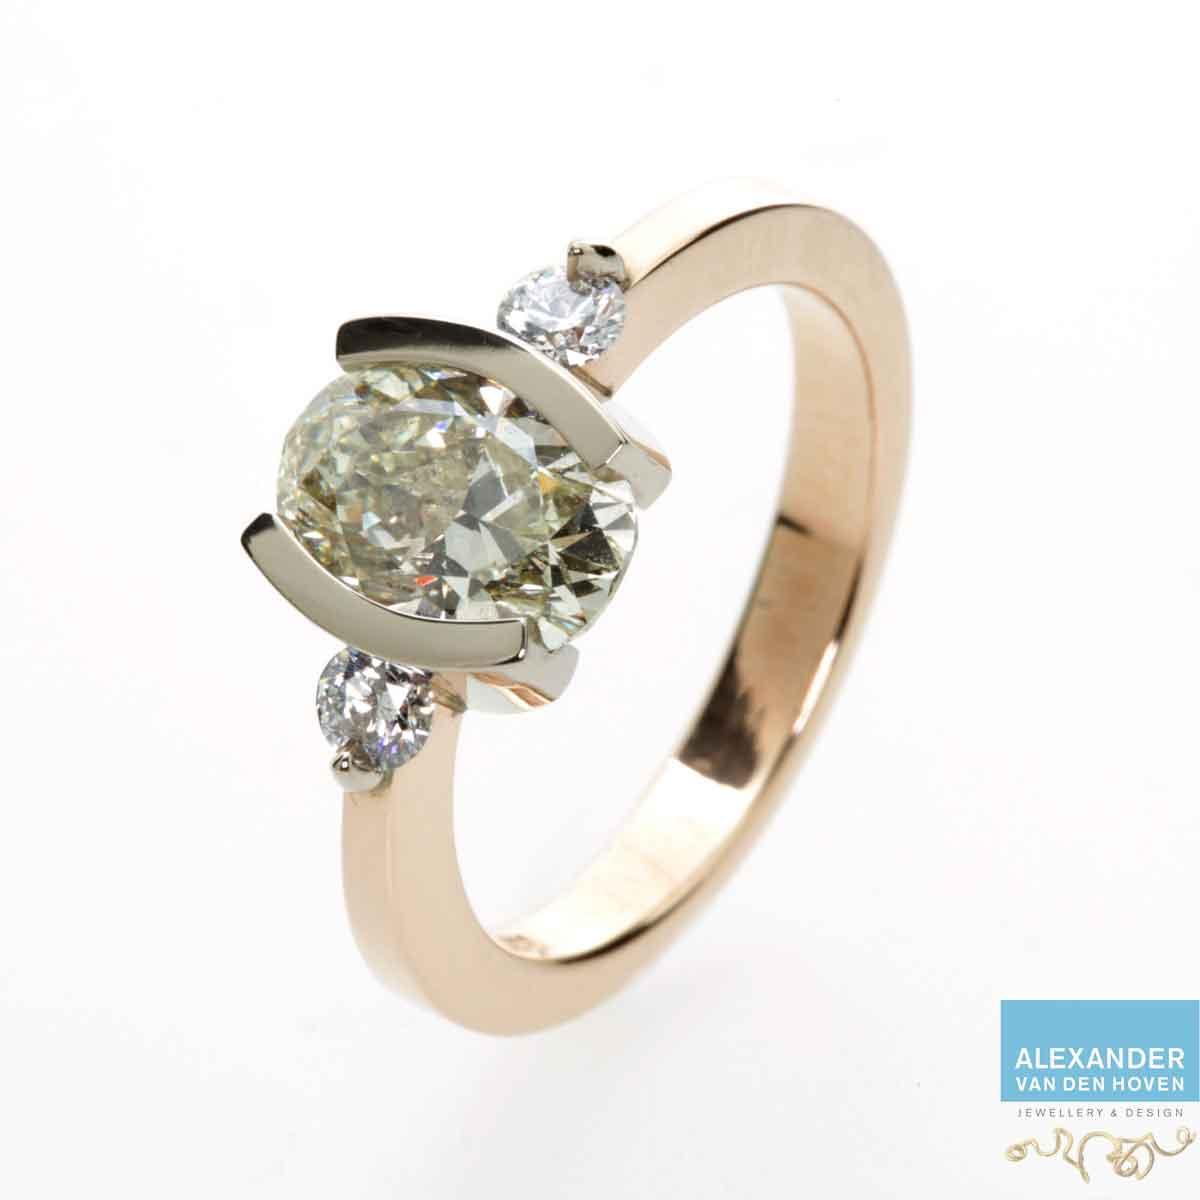 Gouden Solitair Diamant ring, ovale briljant en 2 rond briljanten